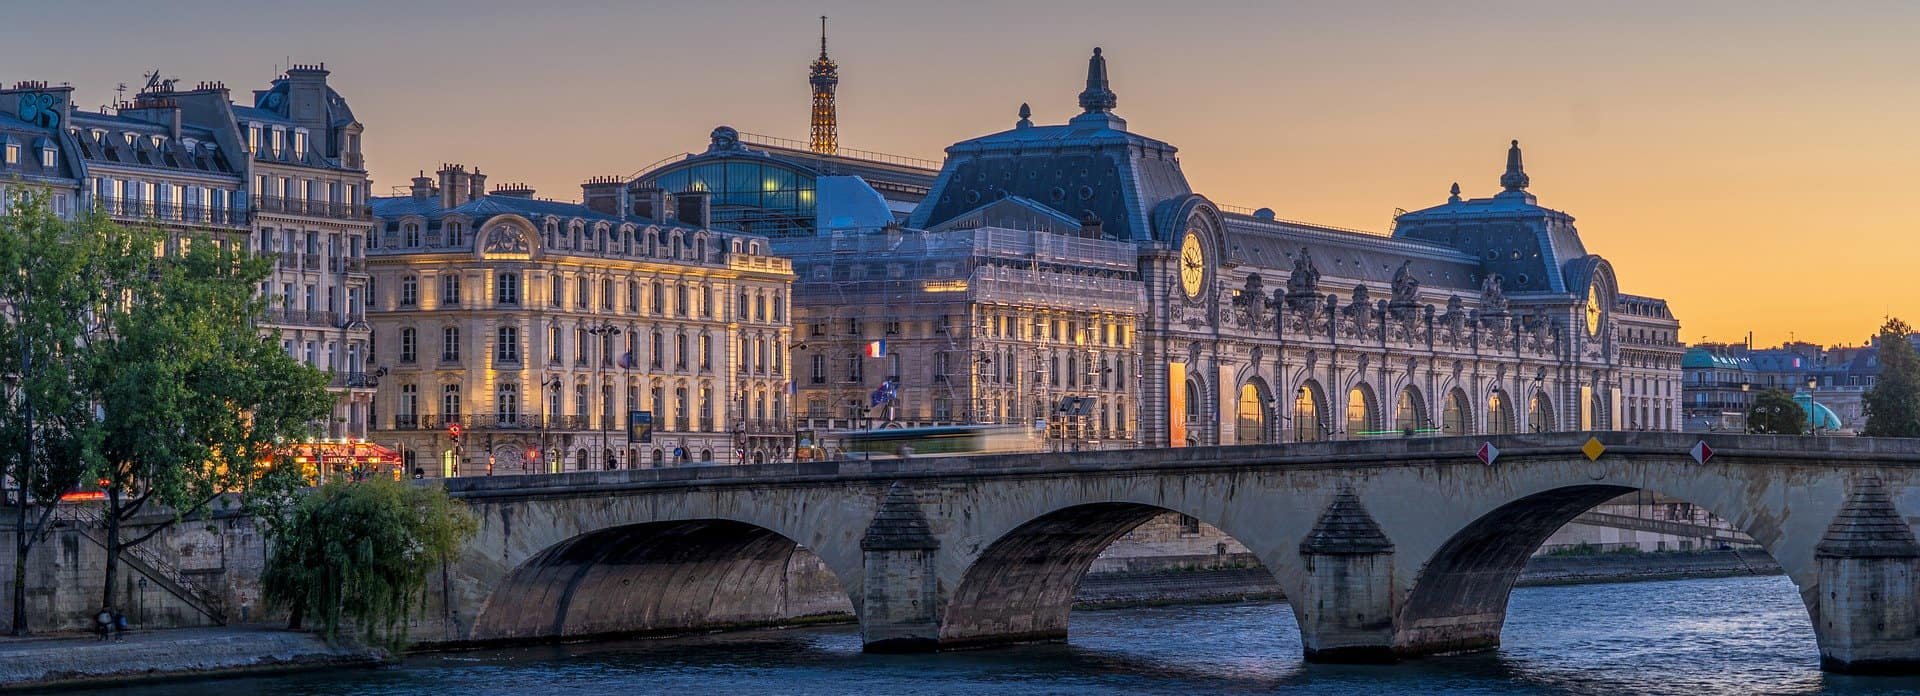 quel musee visiter a paris